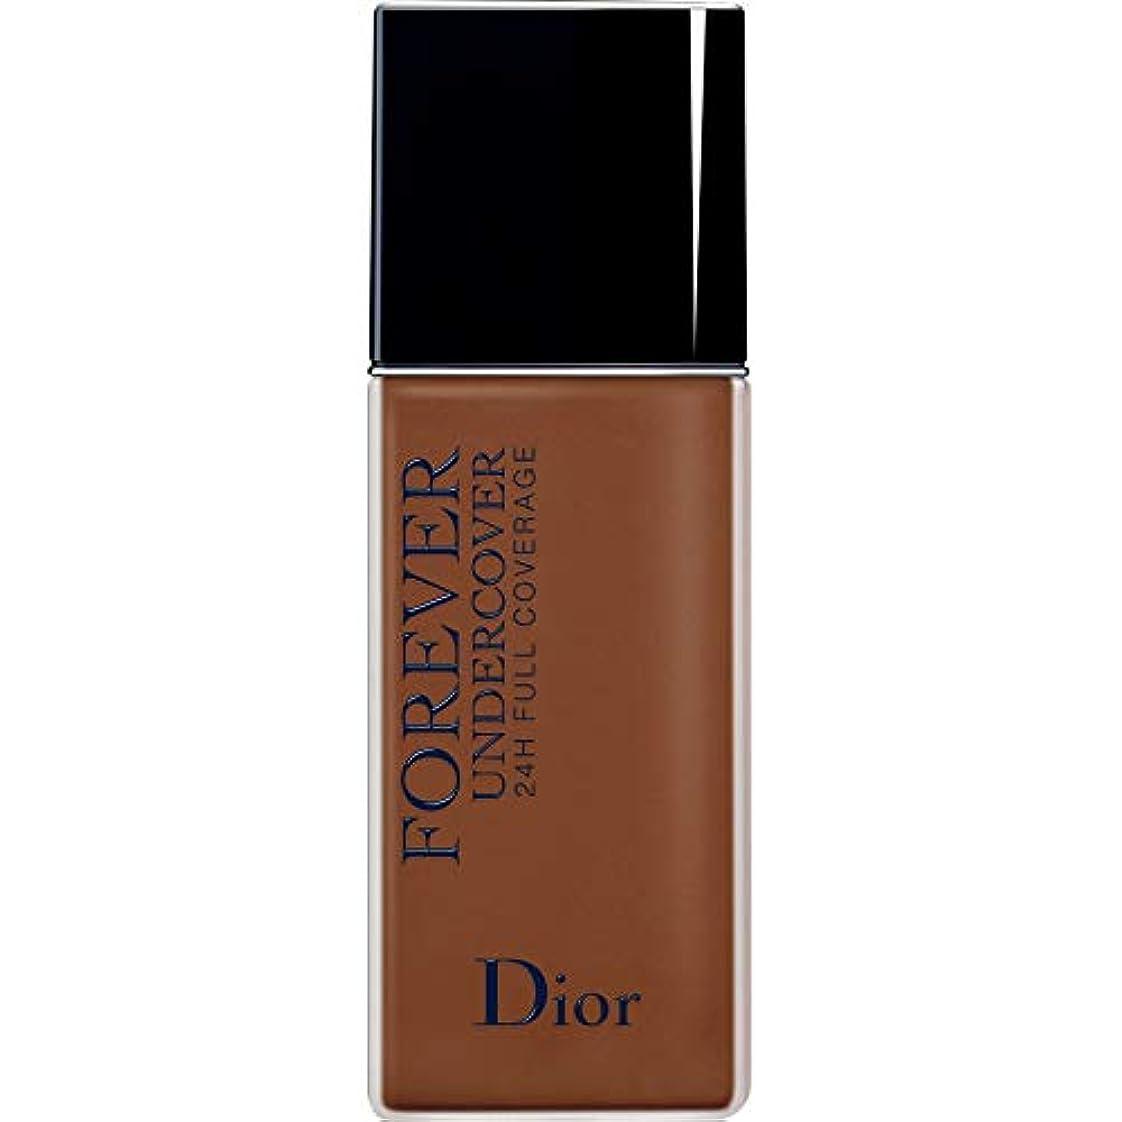 [Dior ] ディオールディオールスキン永遠アンダーカバーフルカバーの基礎40ミリリットル070 - ダークブラウン - DIOR Diorskin Forever Undercover Full Coverage Foundation...